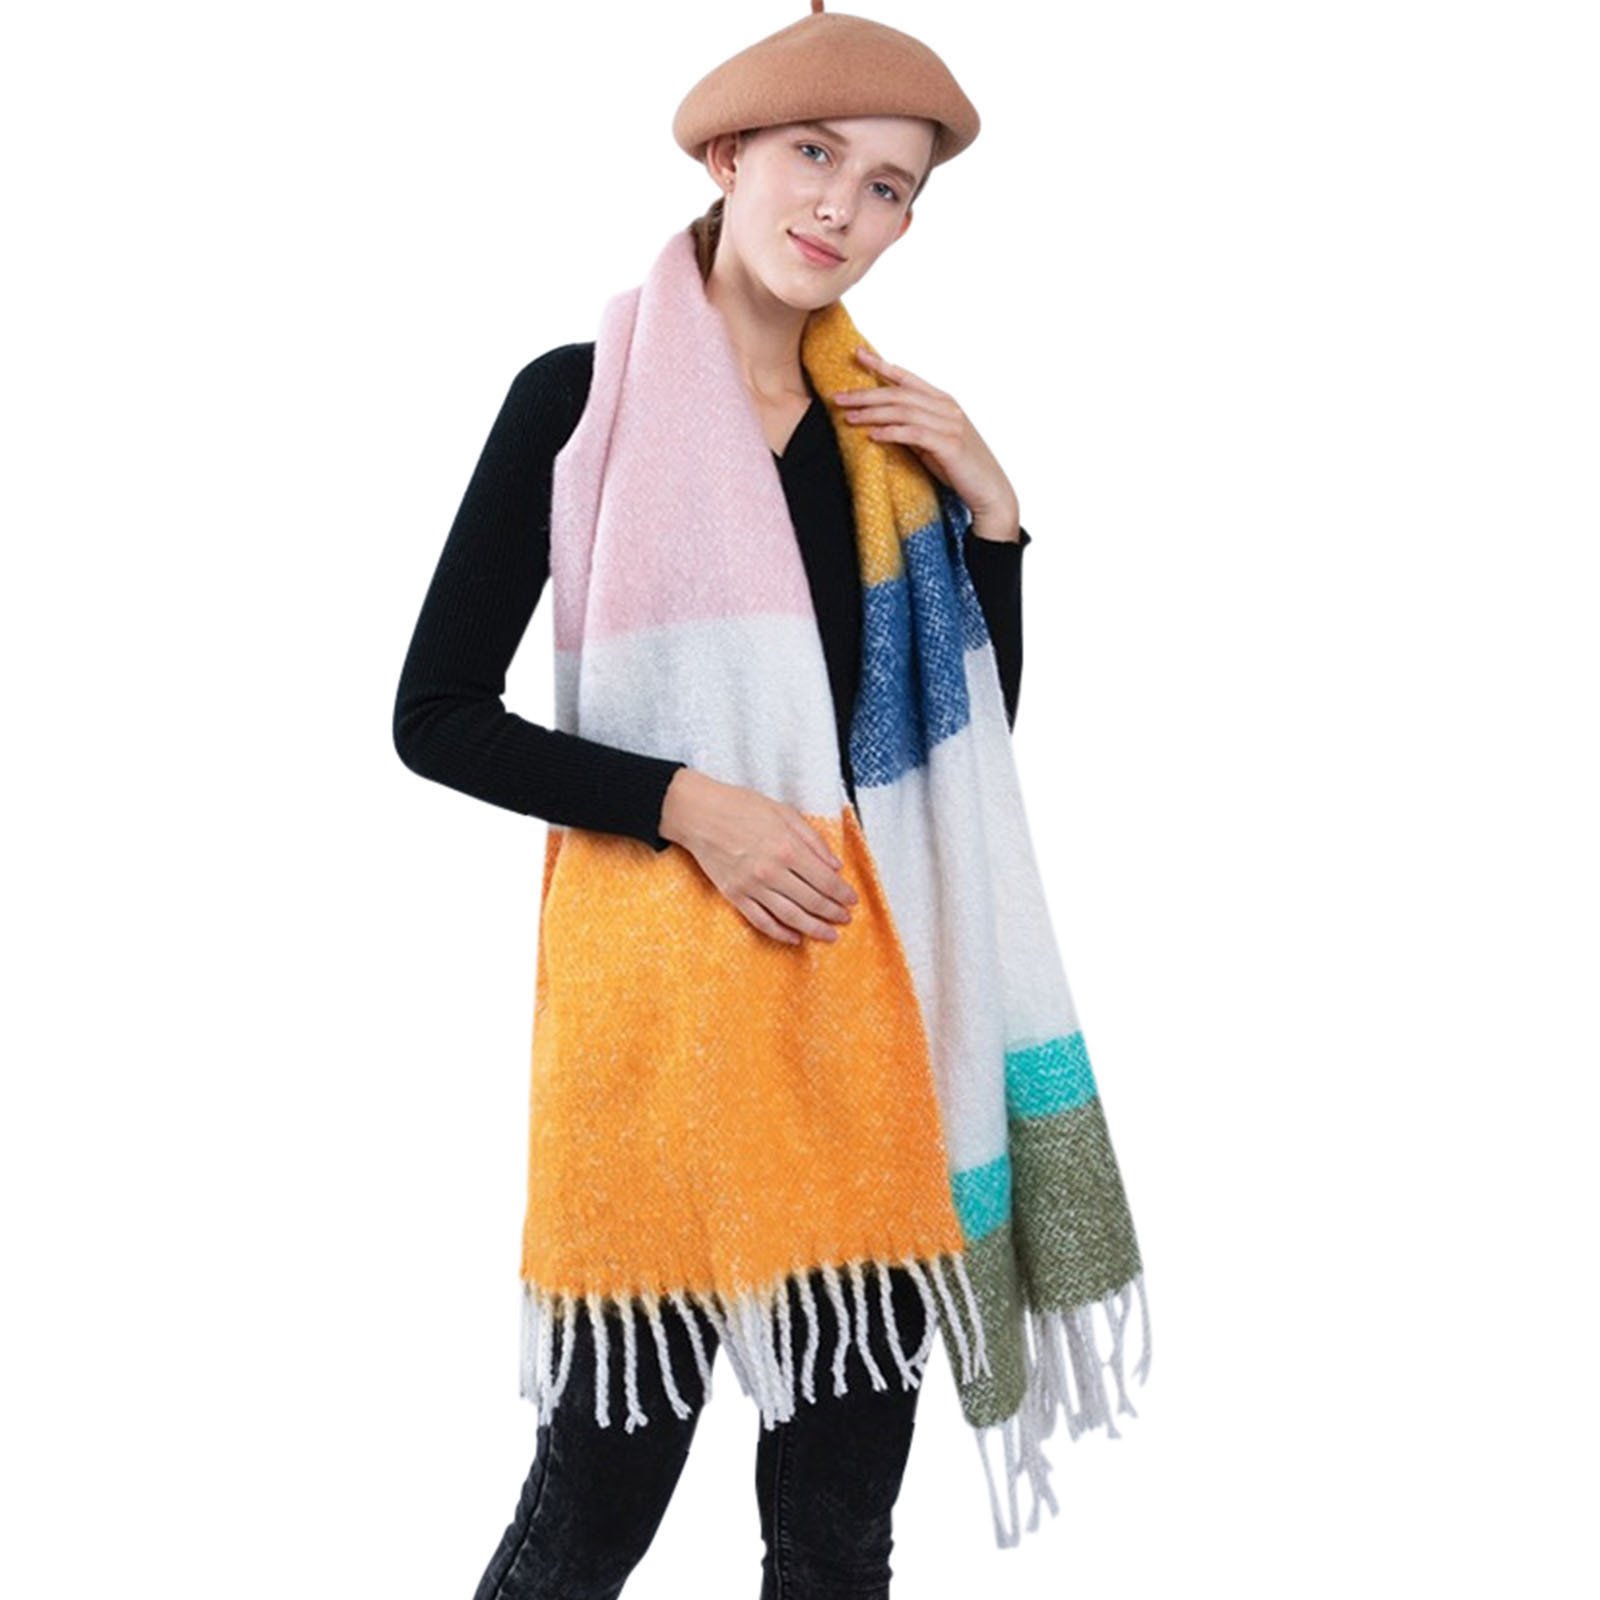 D Women Long Soft Wrap Casual Warm Scarves Shawls Multicolor Stripe Soft Scarf  2020 Multi-Purpose Scarf шарфов шарф женский